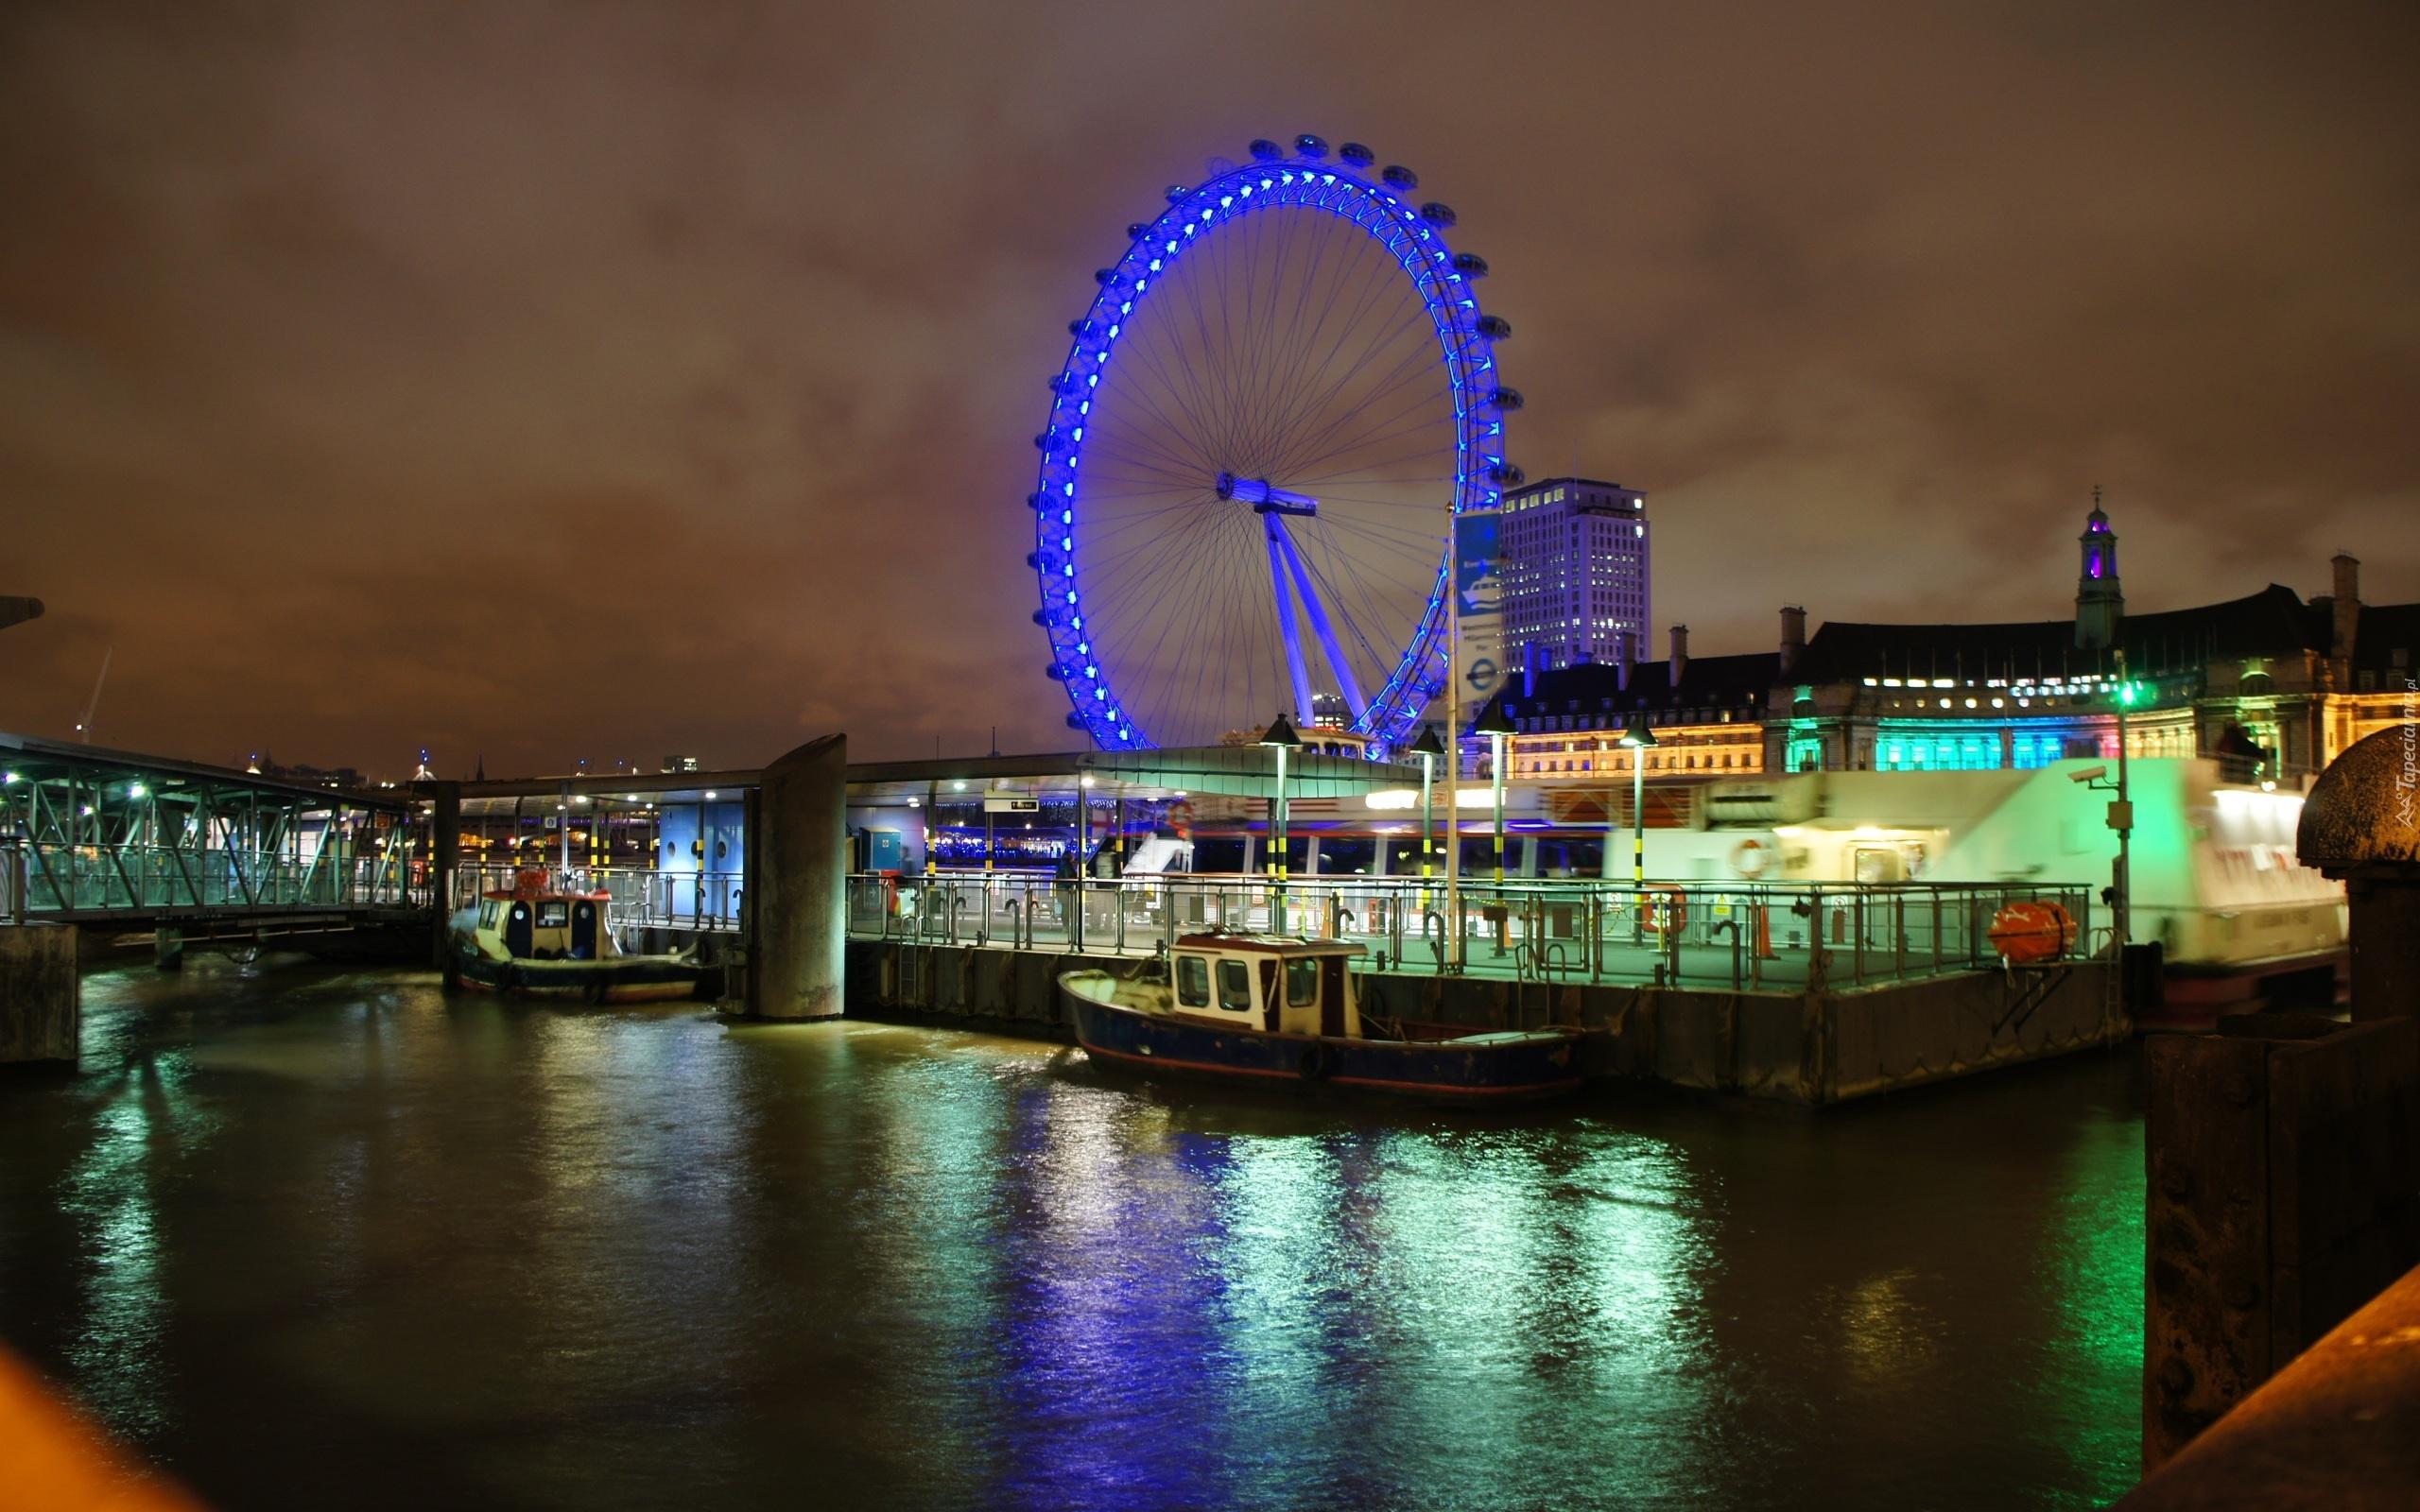 180540_london_eye_londyn_panorama.jpg